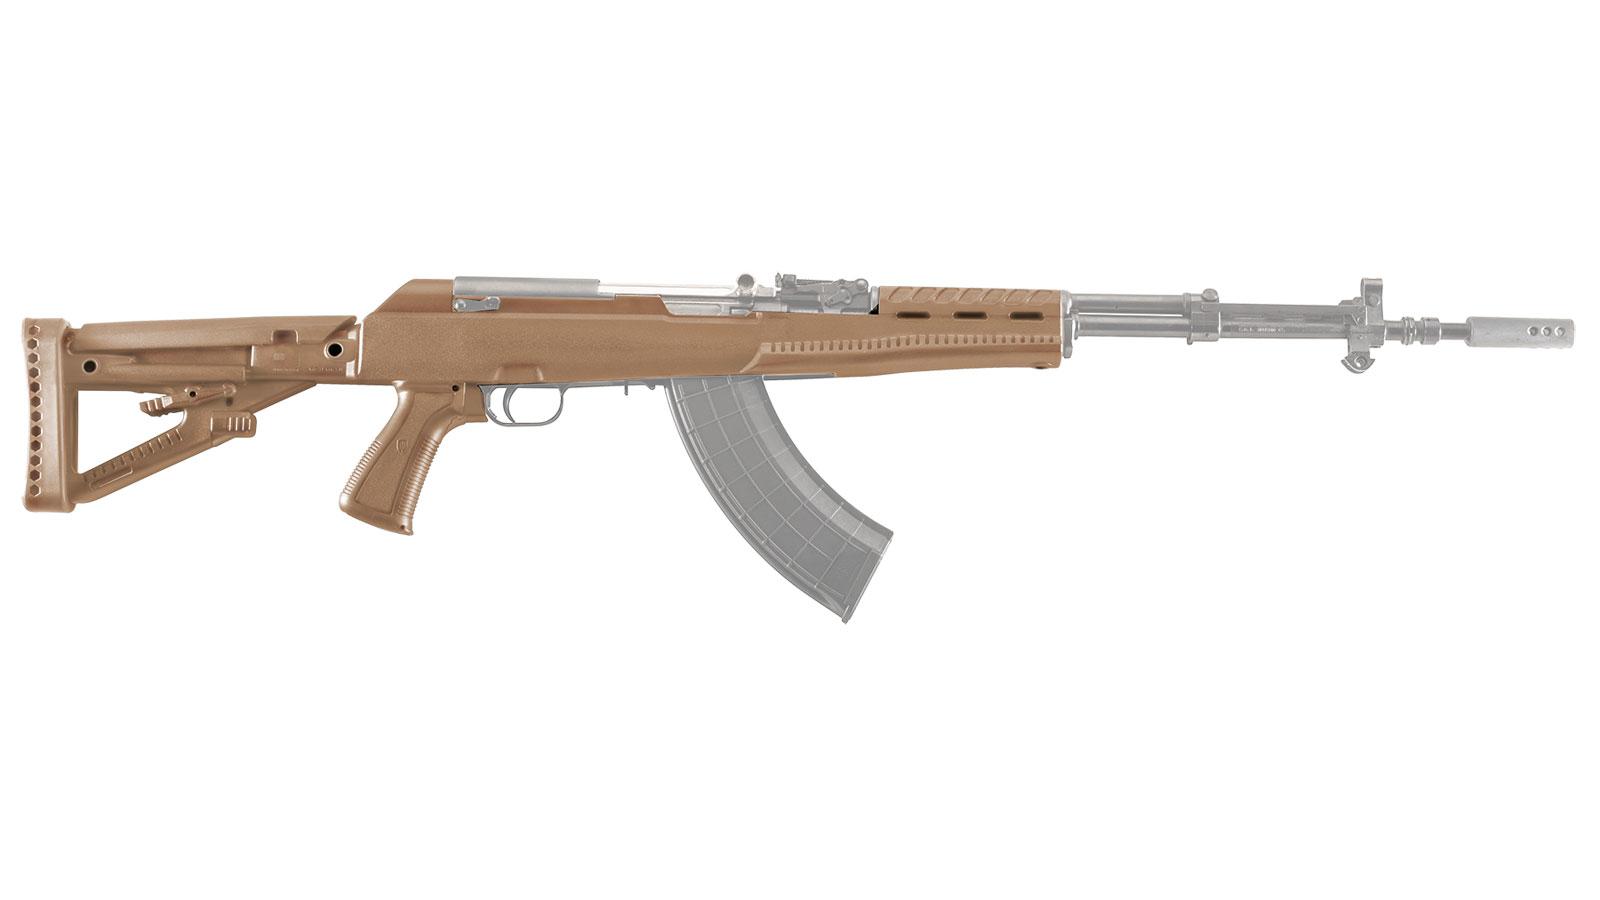 ProMag AASKSDT Archangel OPFOR Rifle Polymer Desert Tan